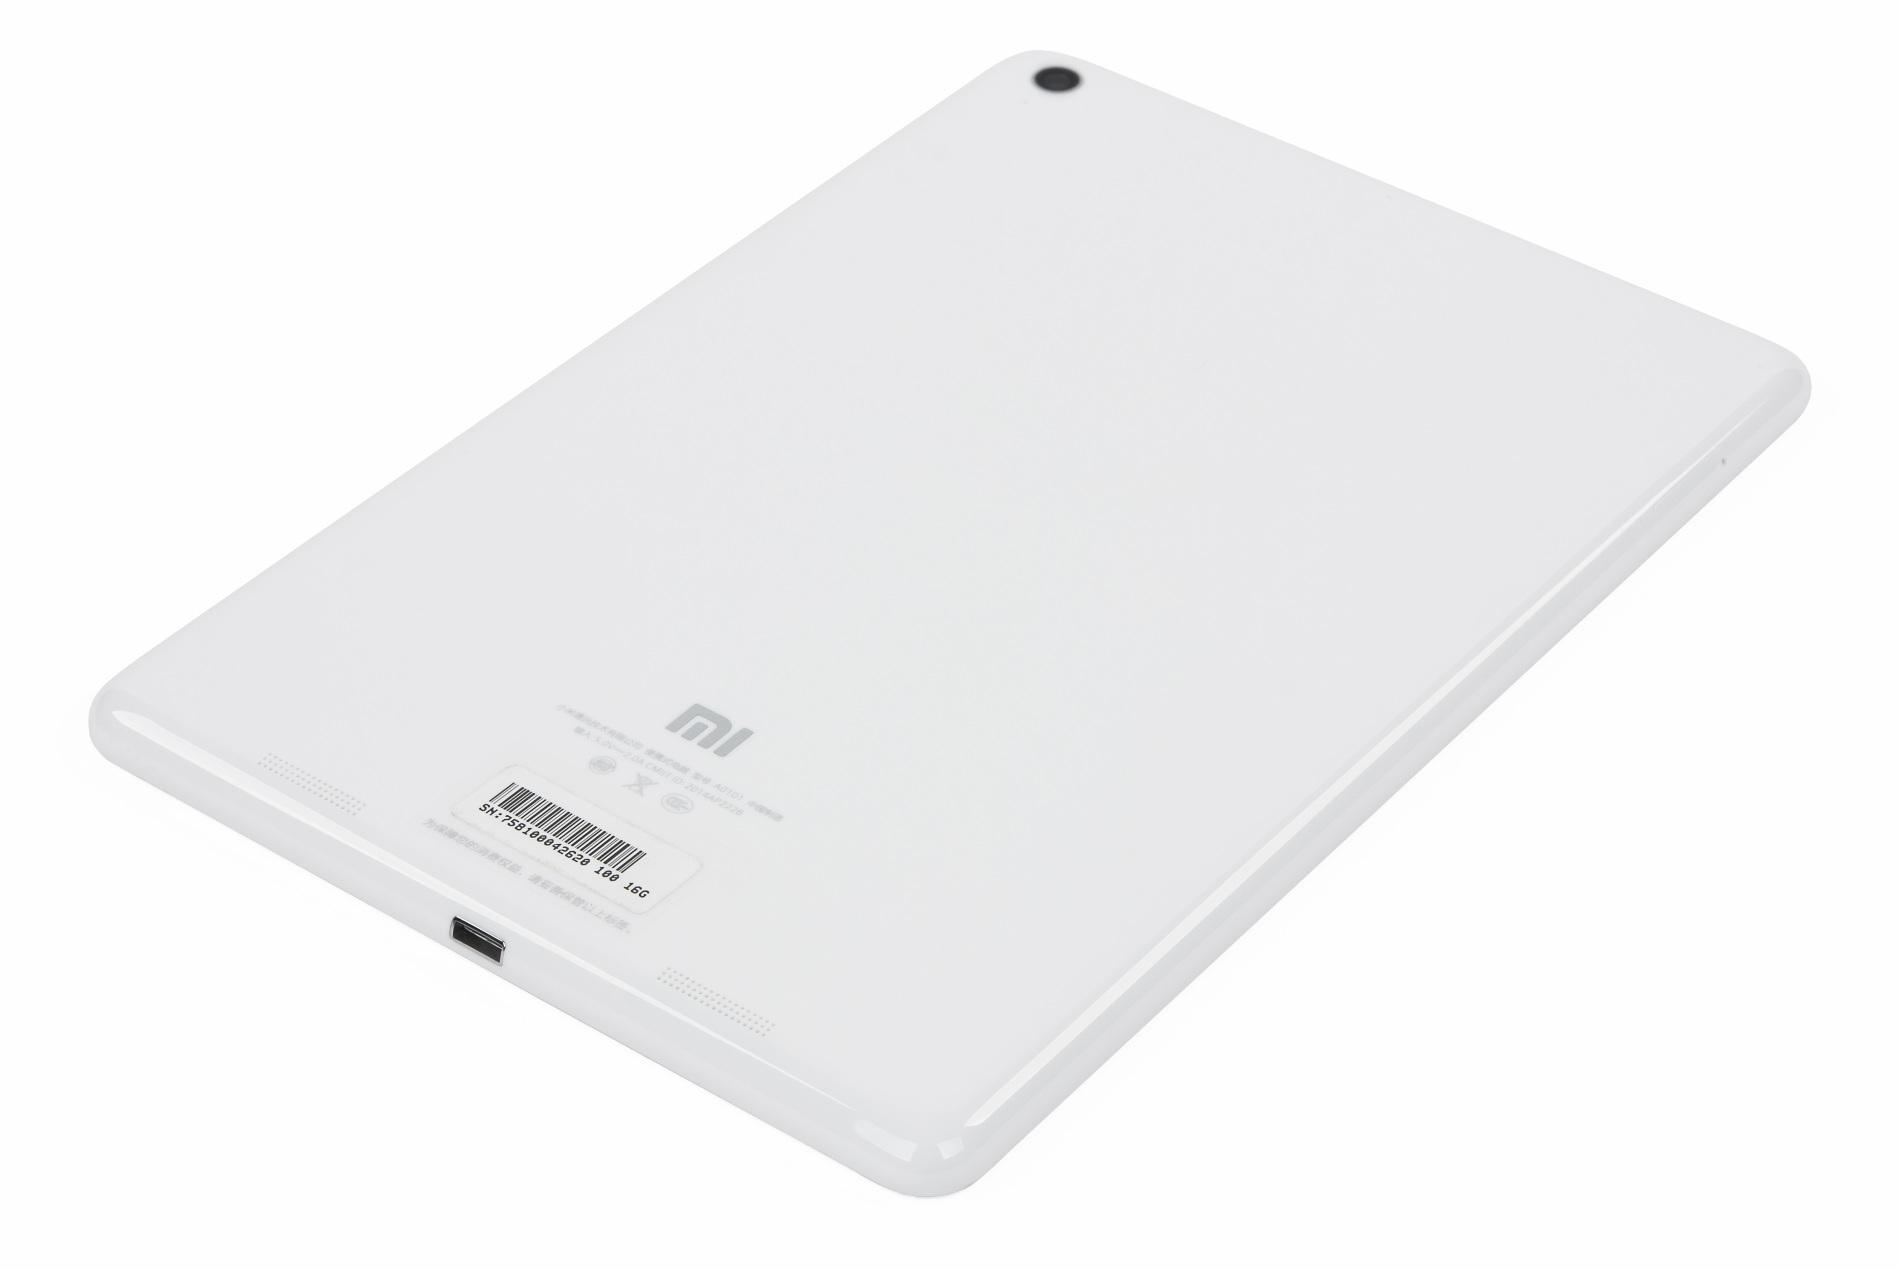 Xiaomi Mi Pad 7,9 16Gb - Задняя панель